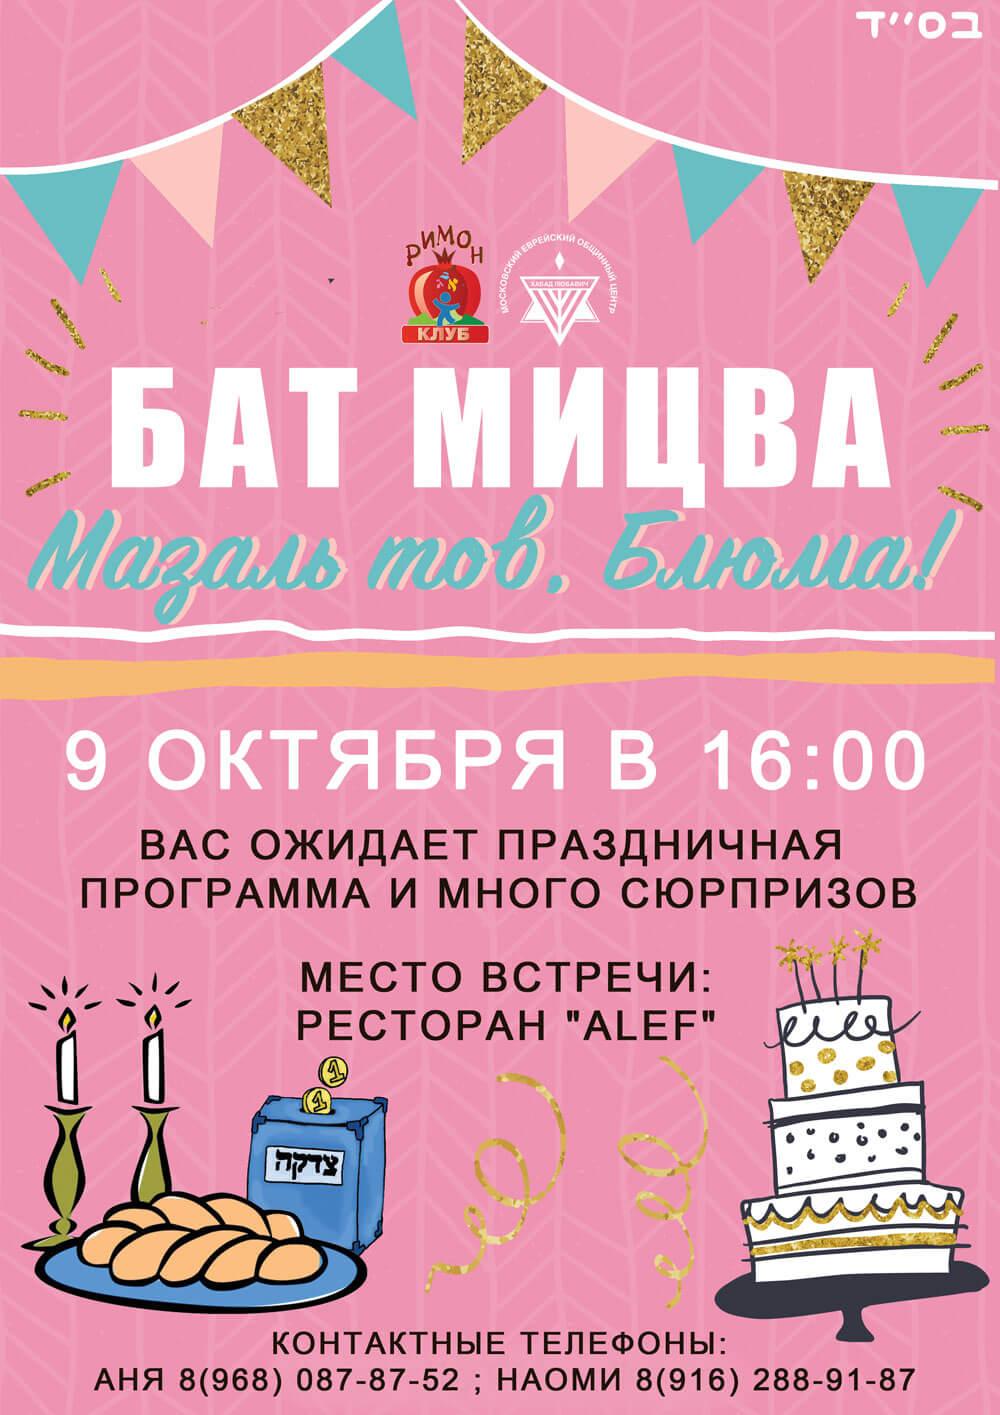 batmizvah09-10